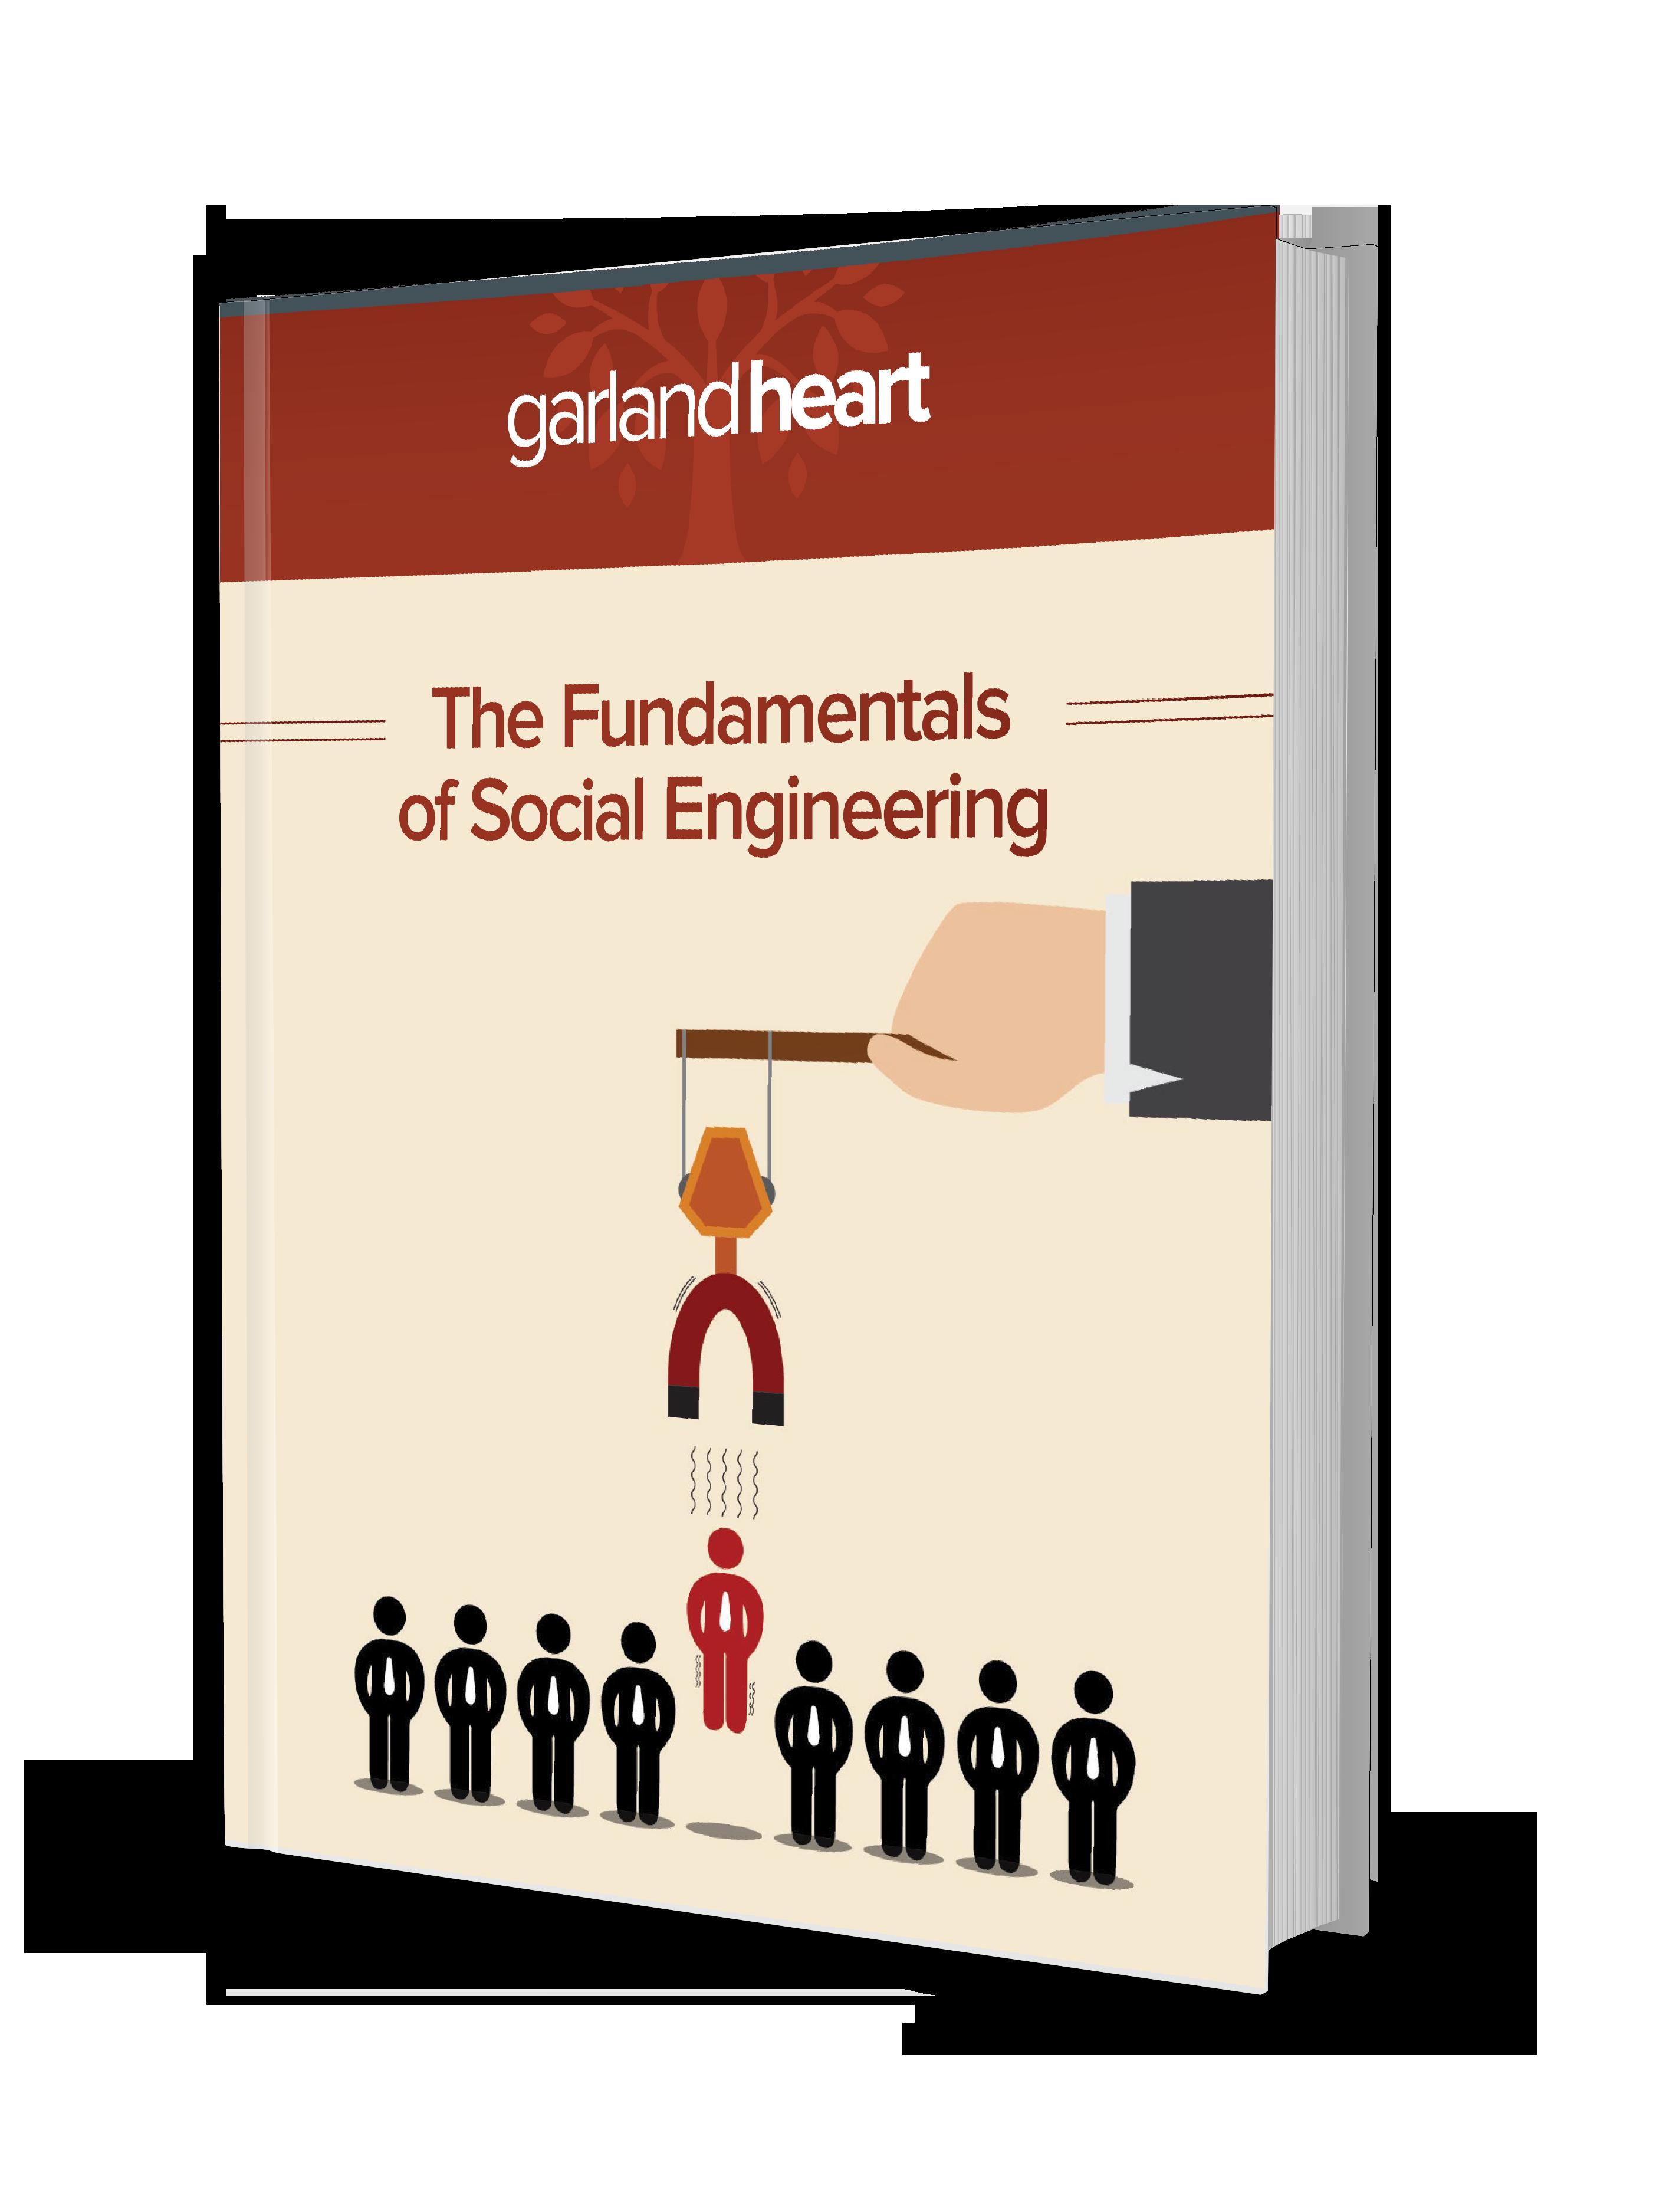 The Fundamentals of Social Engineering